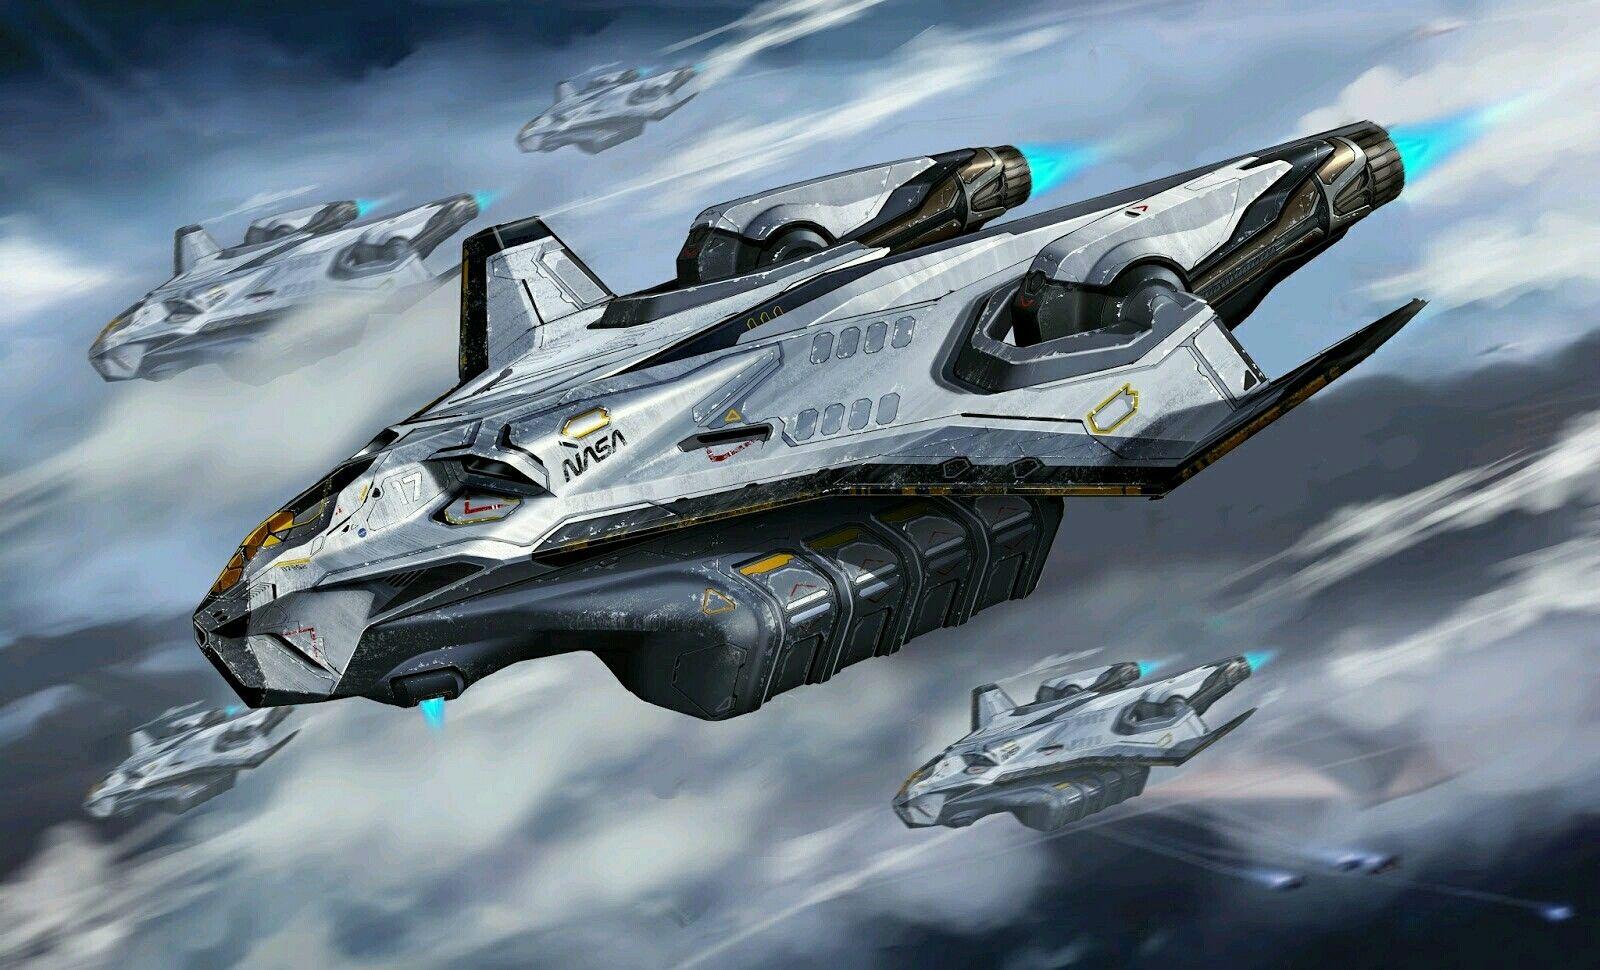 Pin by Ruslan Ganiyev on Sci-Fi Ships Concepts | Space ...